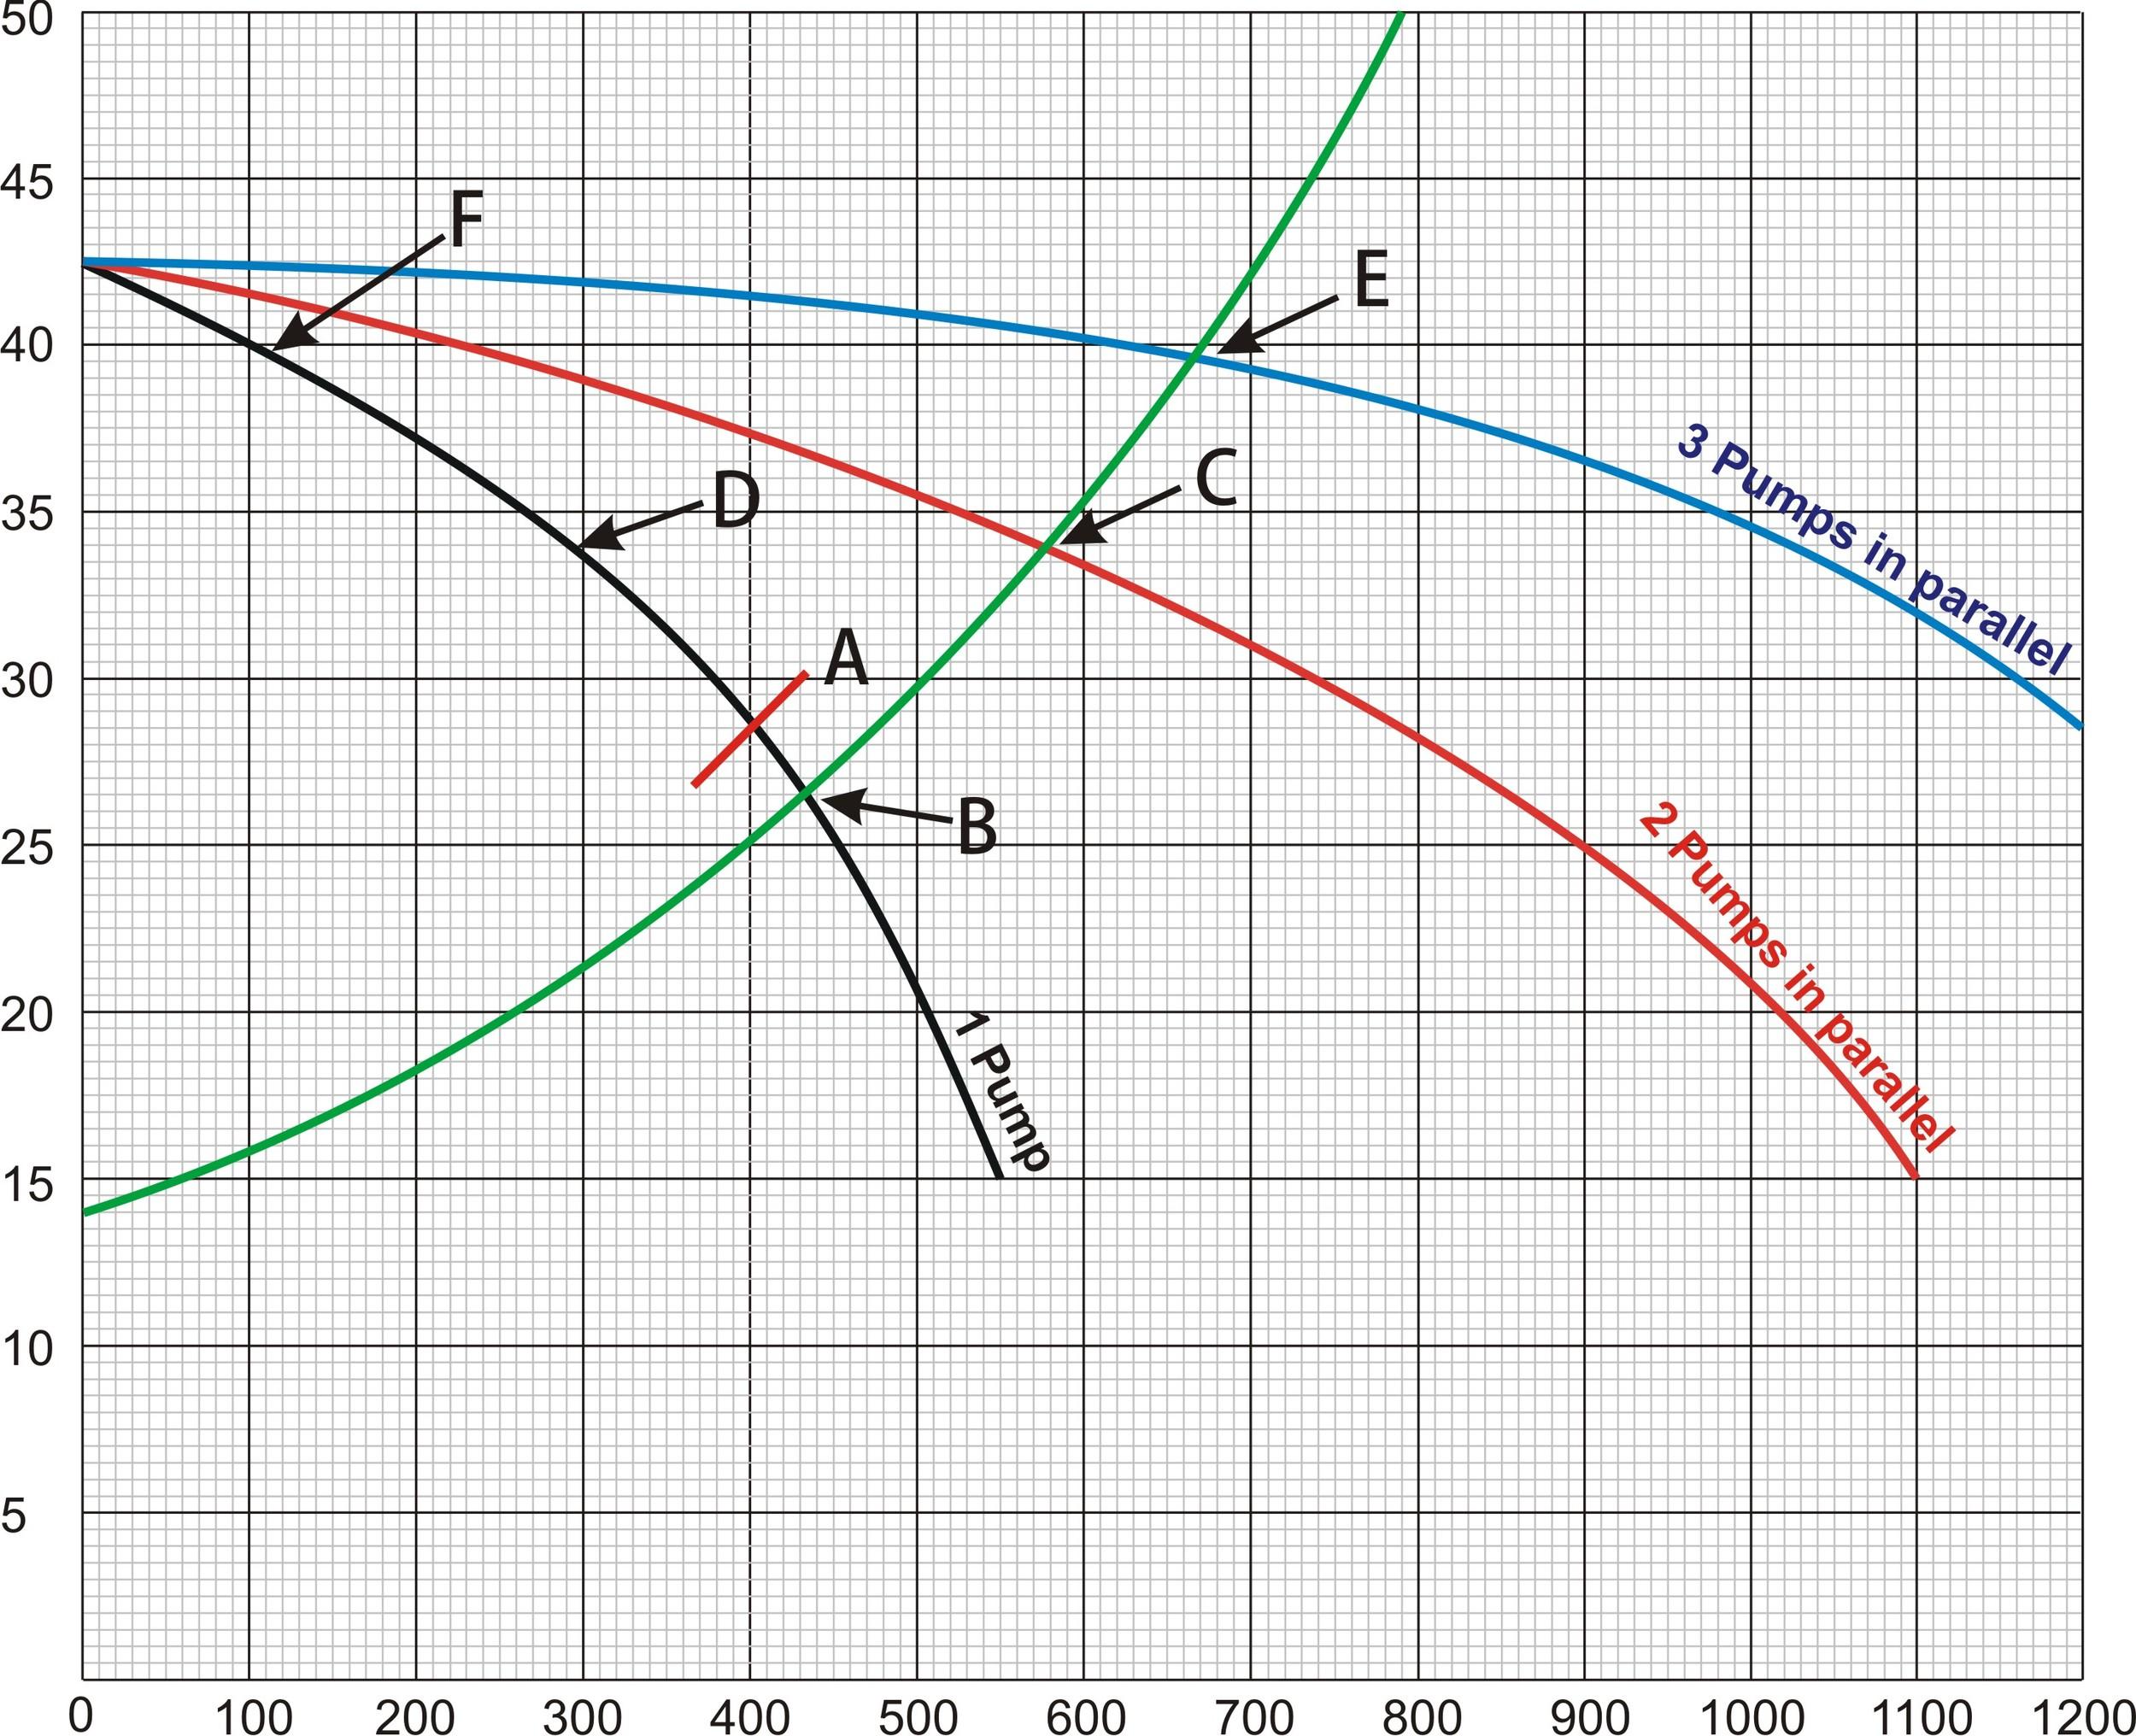 Energy Cash Part 2 curves.jpg